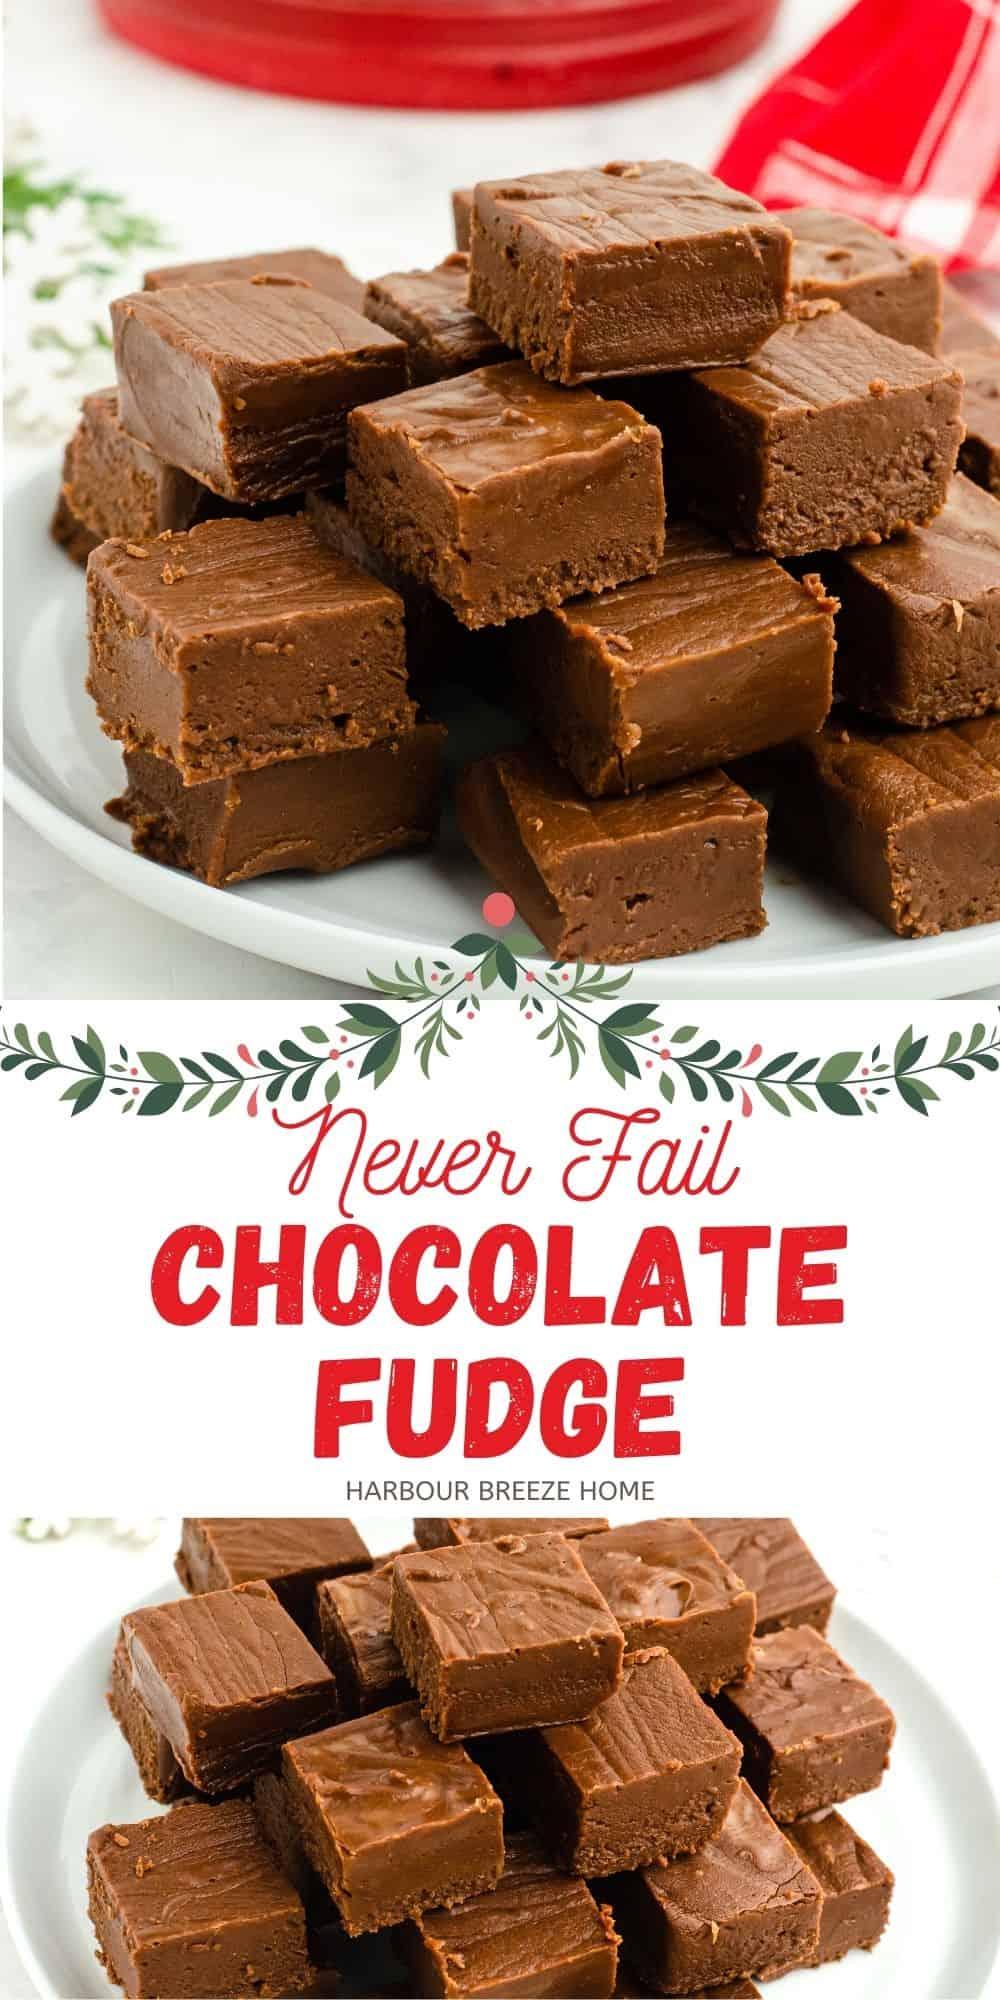 Chocolate Fudge Recipe - Easy and No Fail!